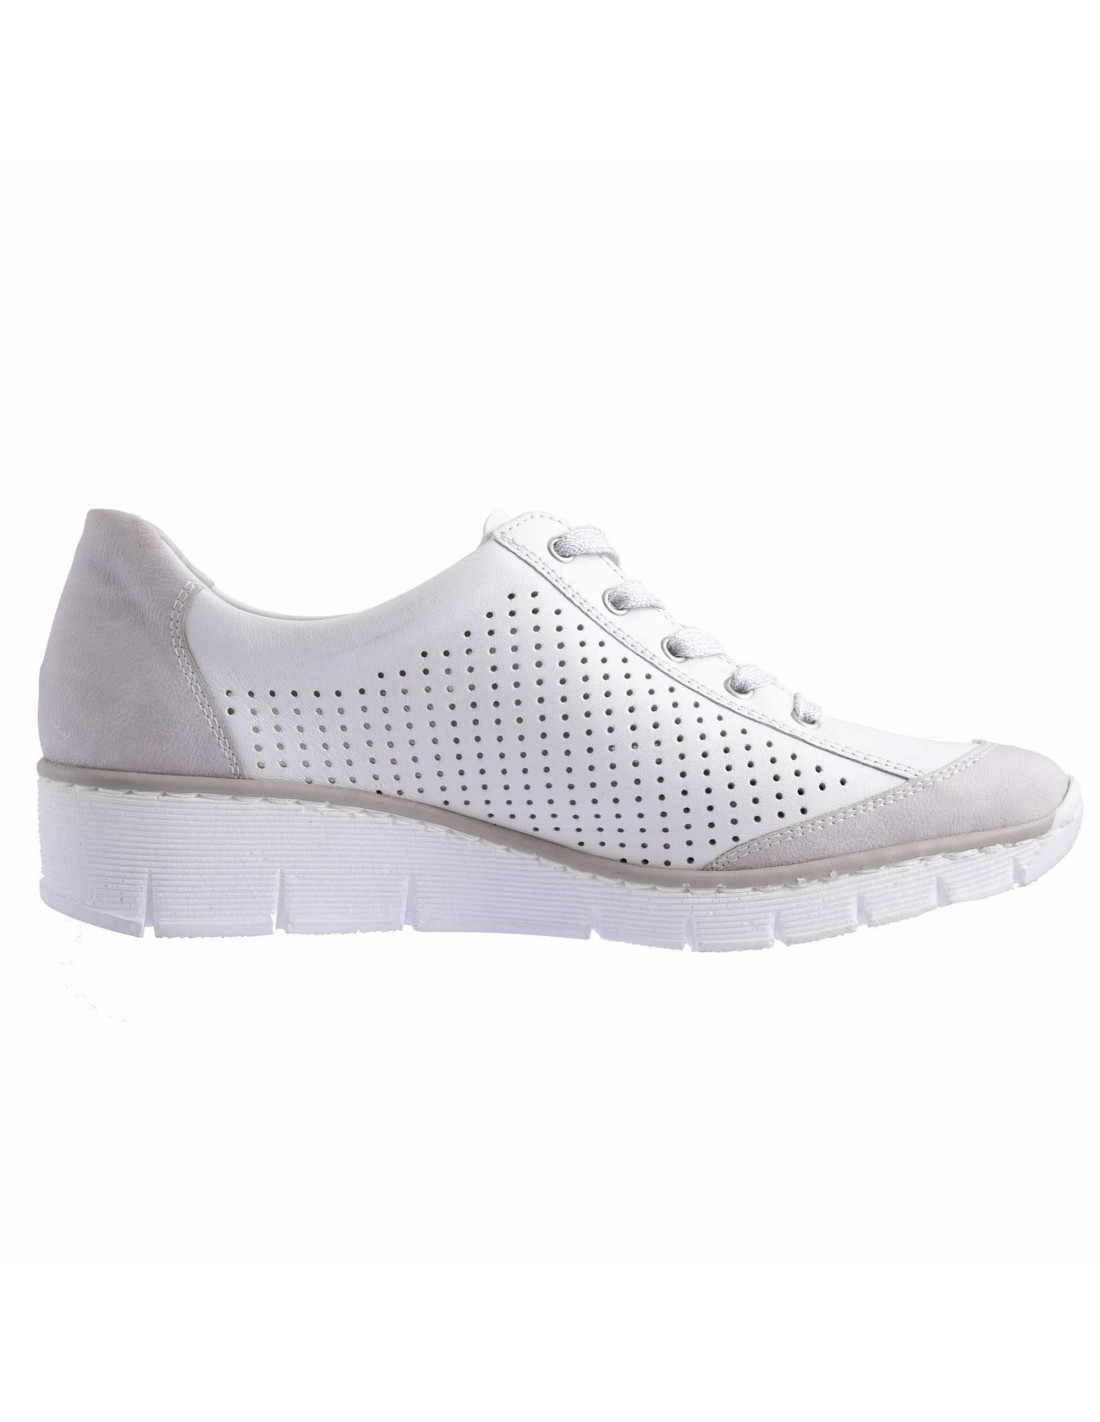 vânzări speciale vânzare ieftină pantofi eleganti Pantofi sport dama, piele naturala, marca Rieker, Cod 53717-